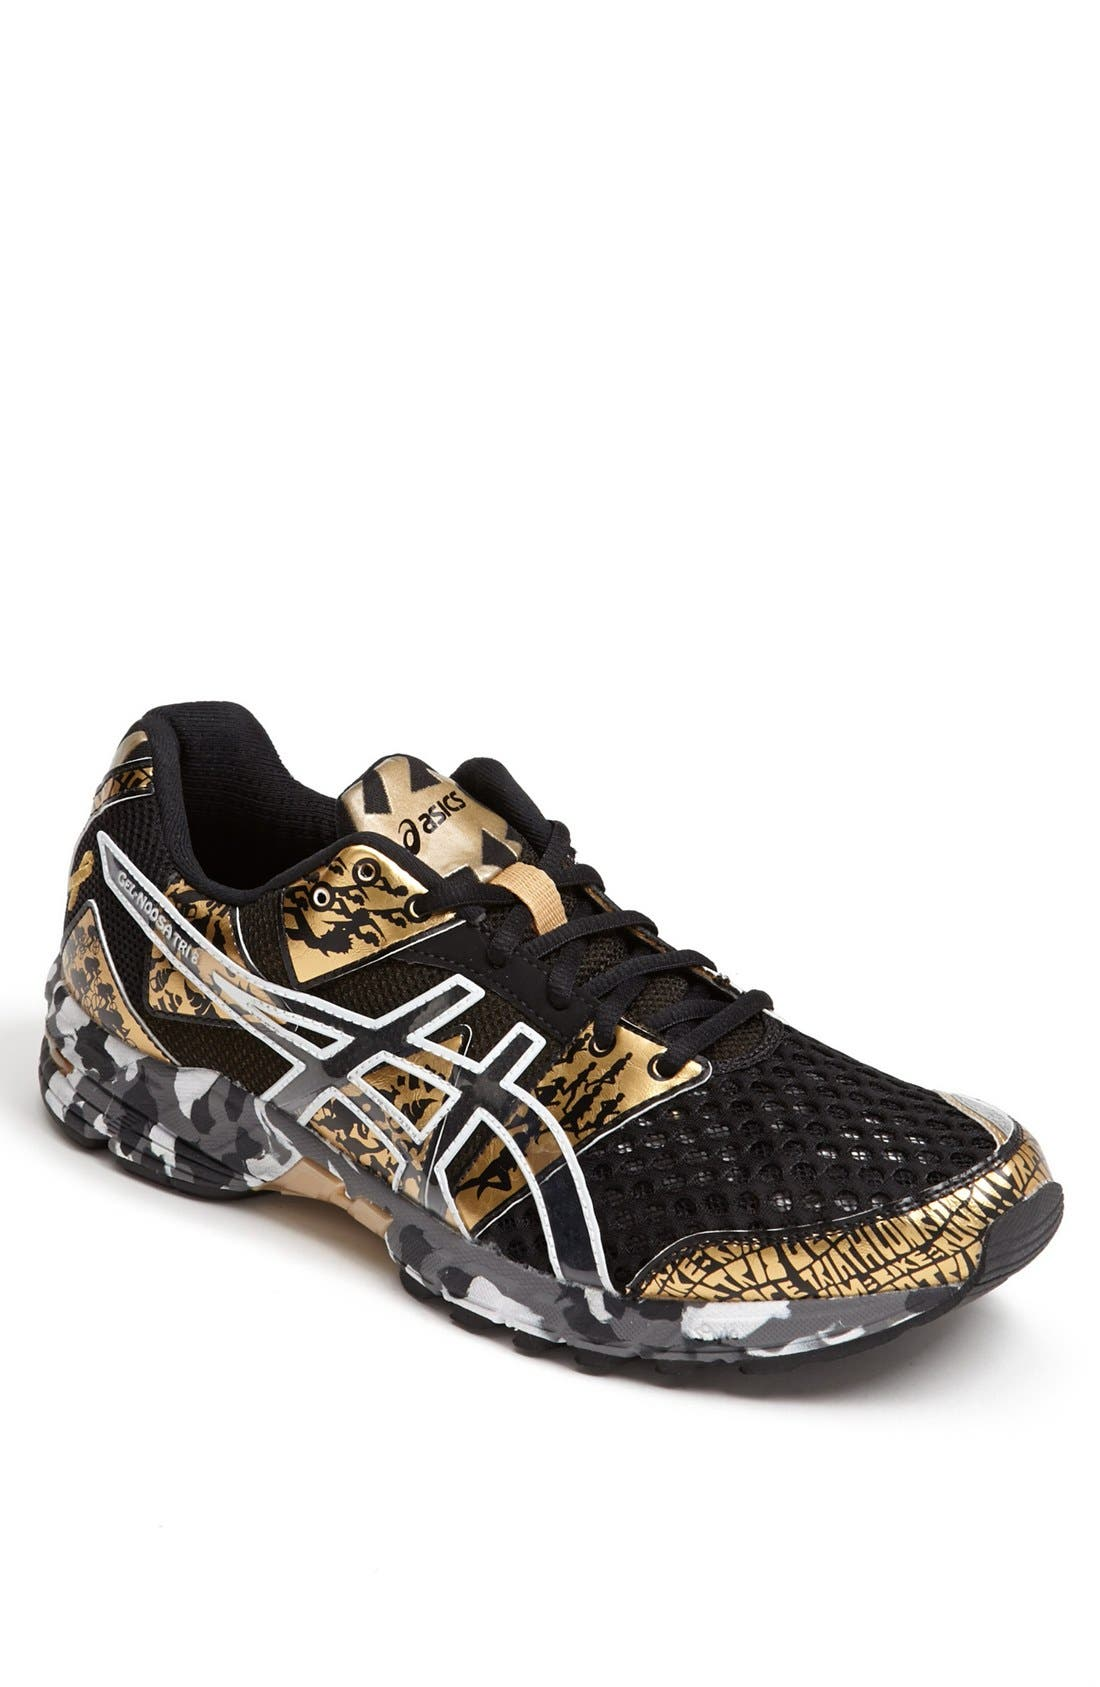 Main Image - ASICS® 'GEL-Noosa Tri 8 GR' Running Shoe (Men)